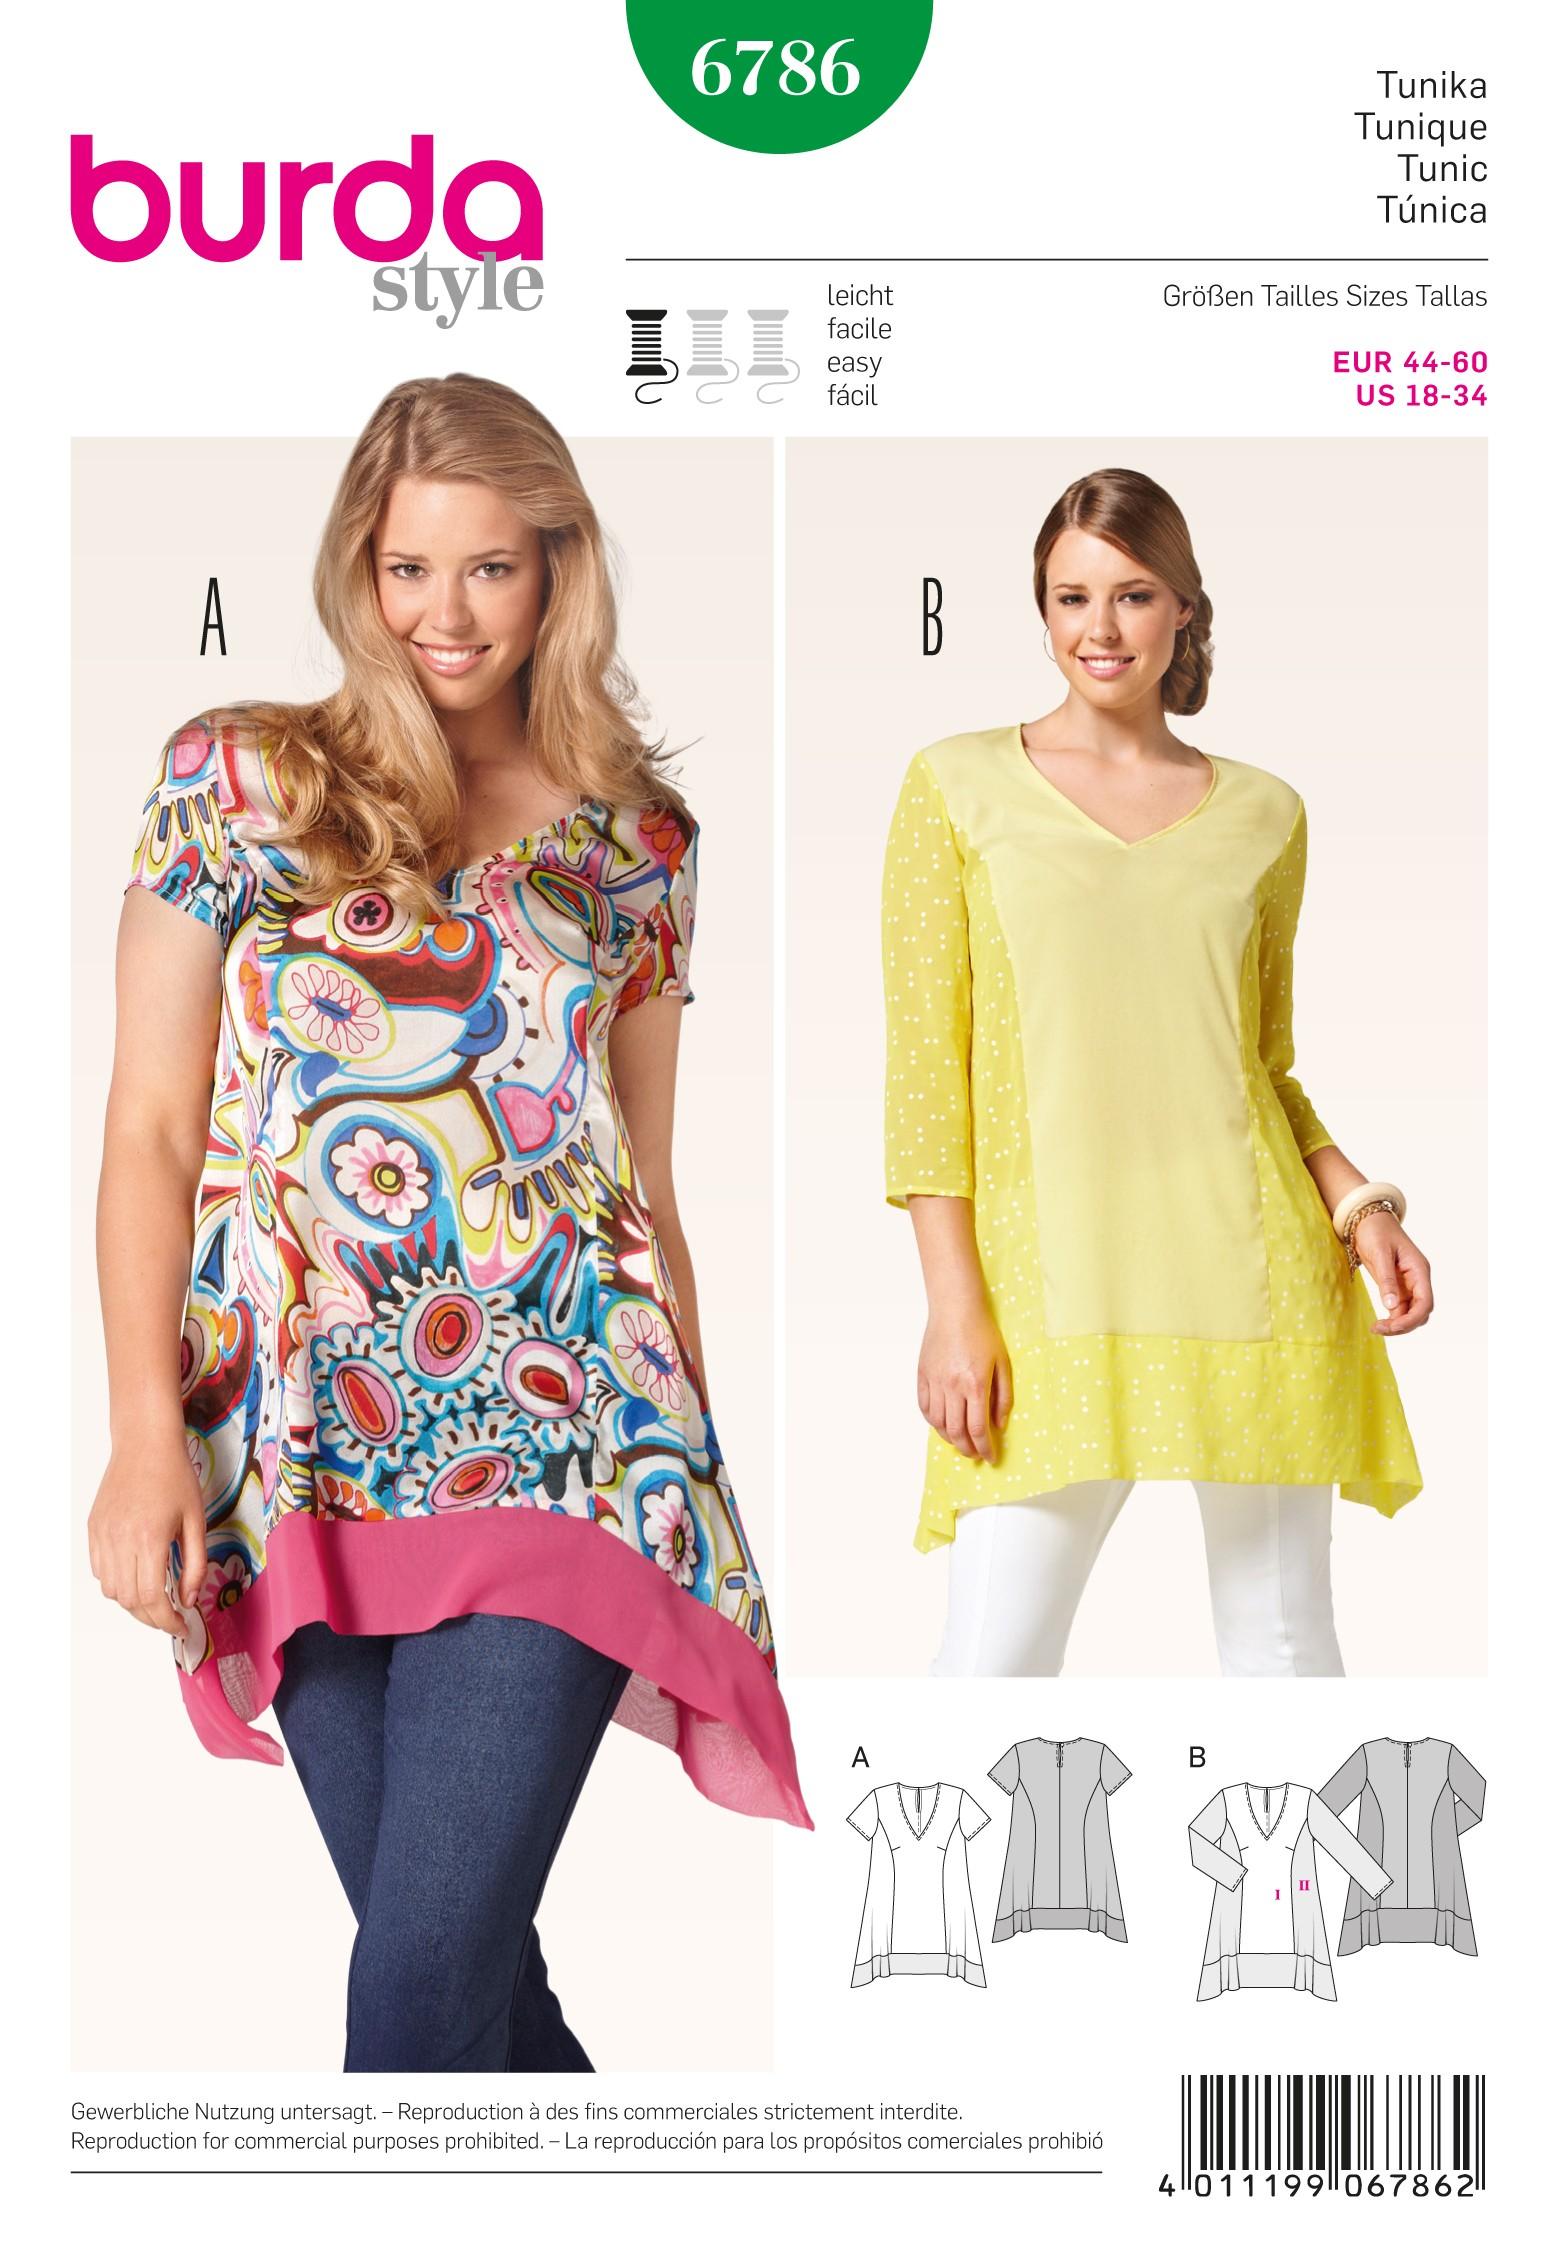 Burda Style Womans' Feminine Collared Blouse Sewing Pattern 6786